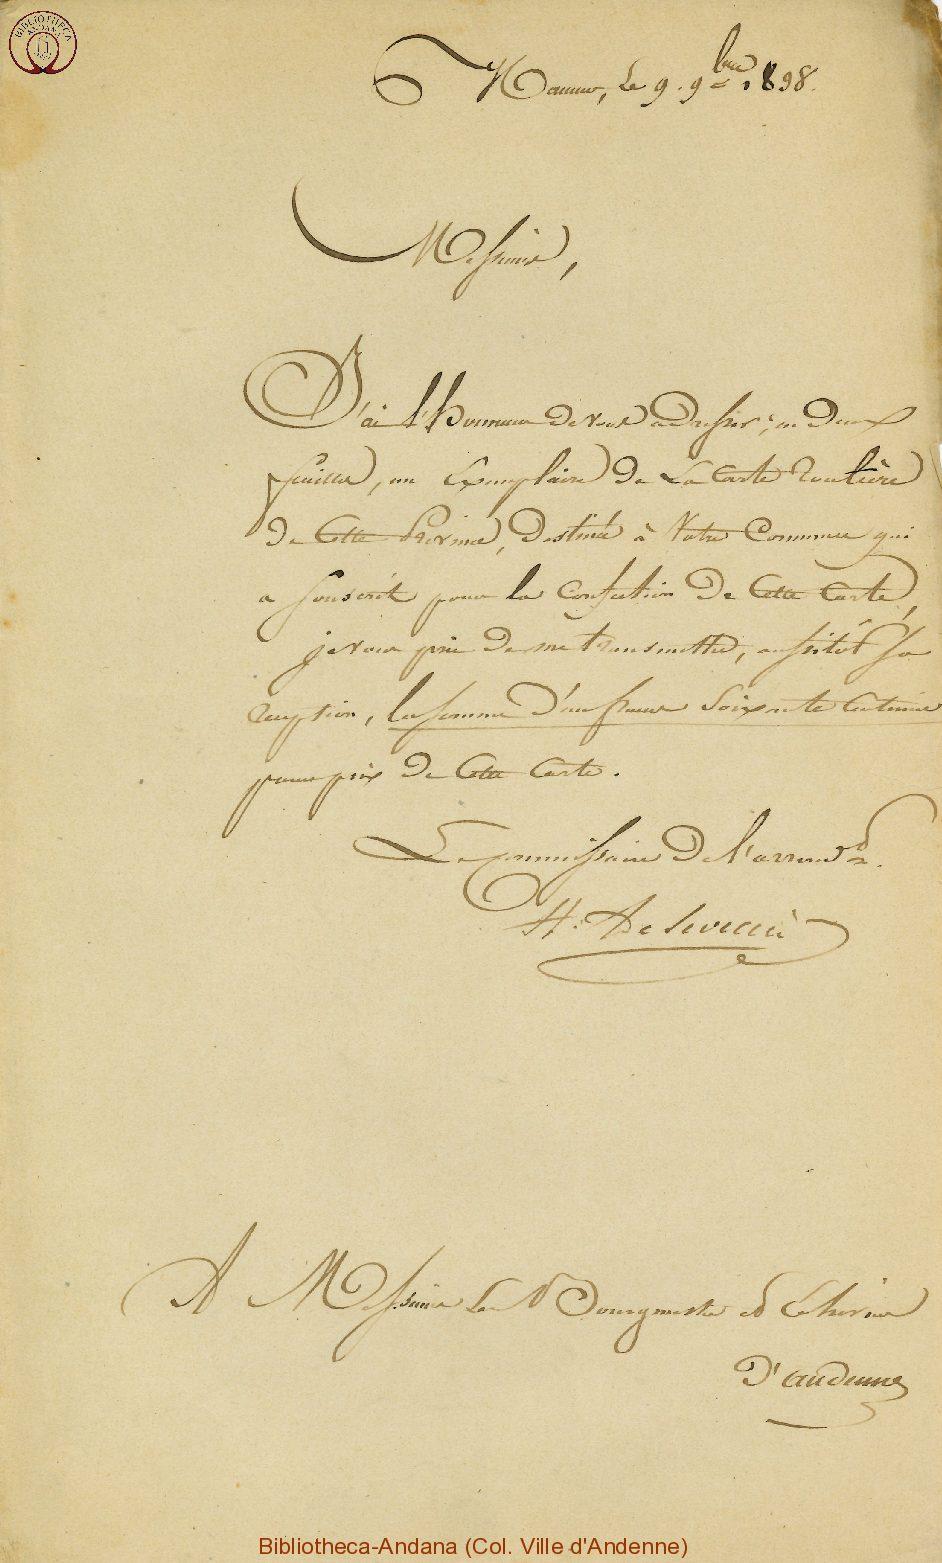 1838-11-09